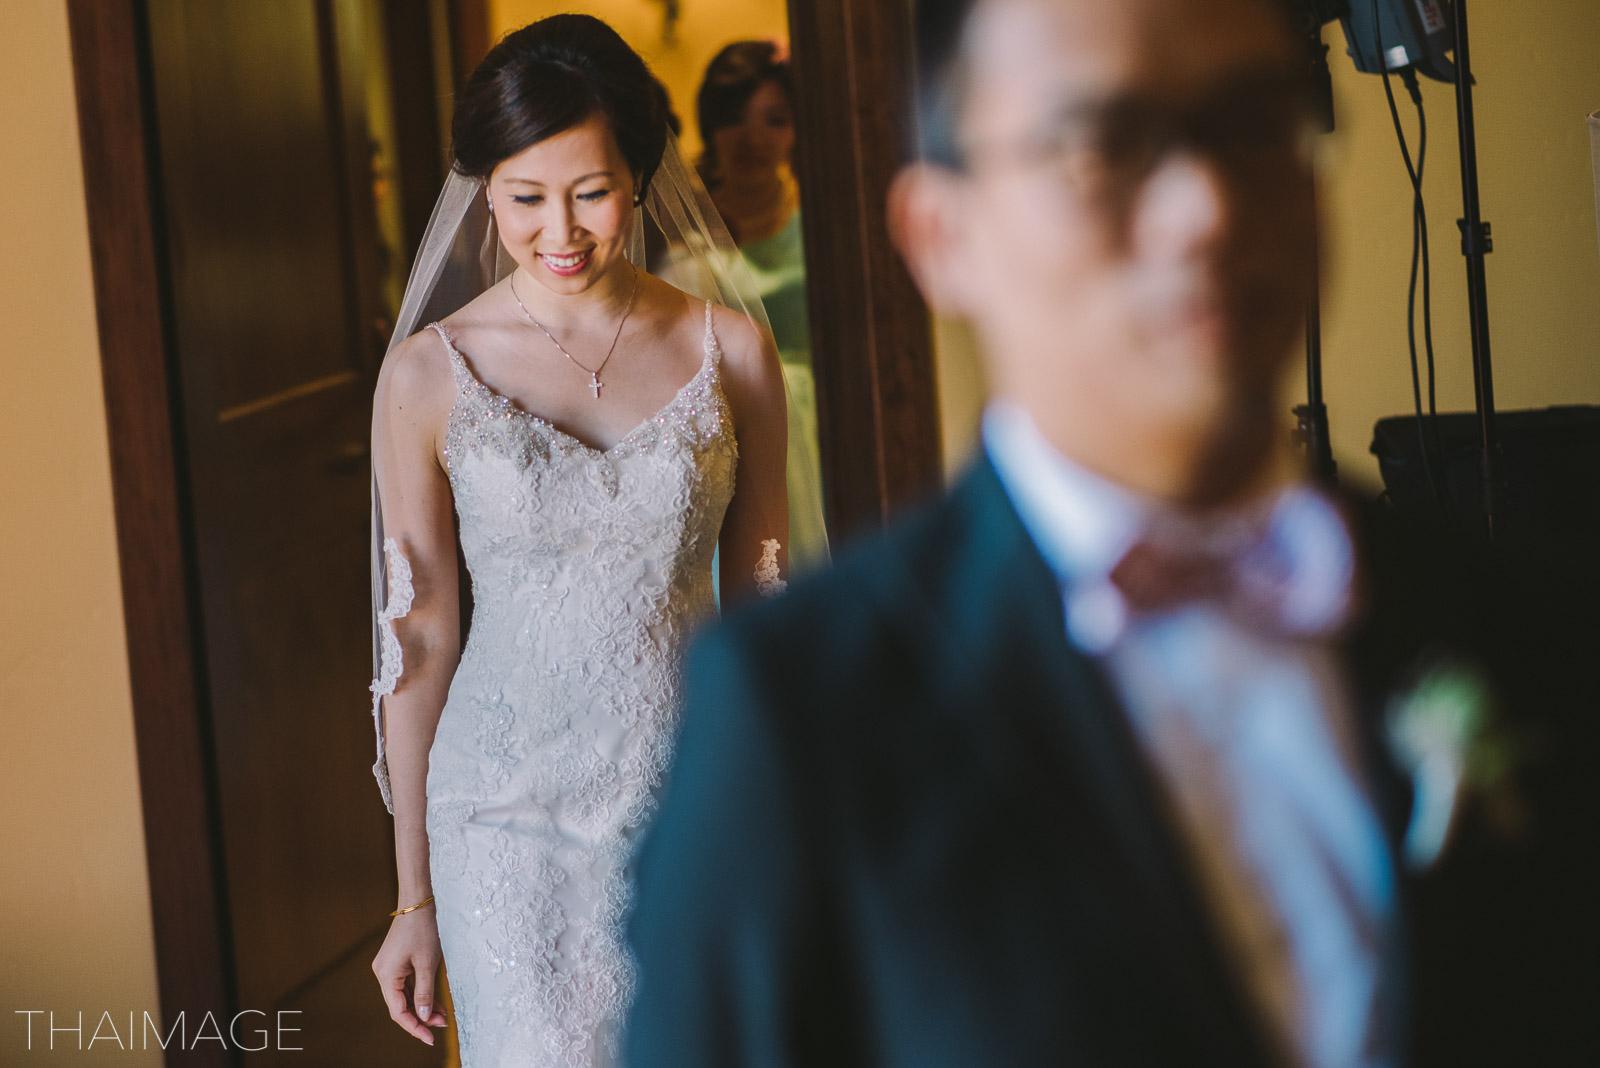 00043-20160612- JuneEdmond-Chung-Wedding.jpg